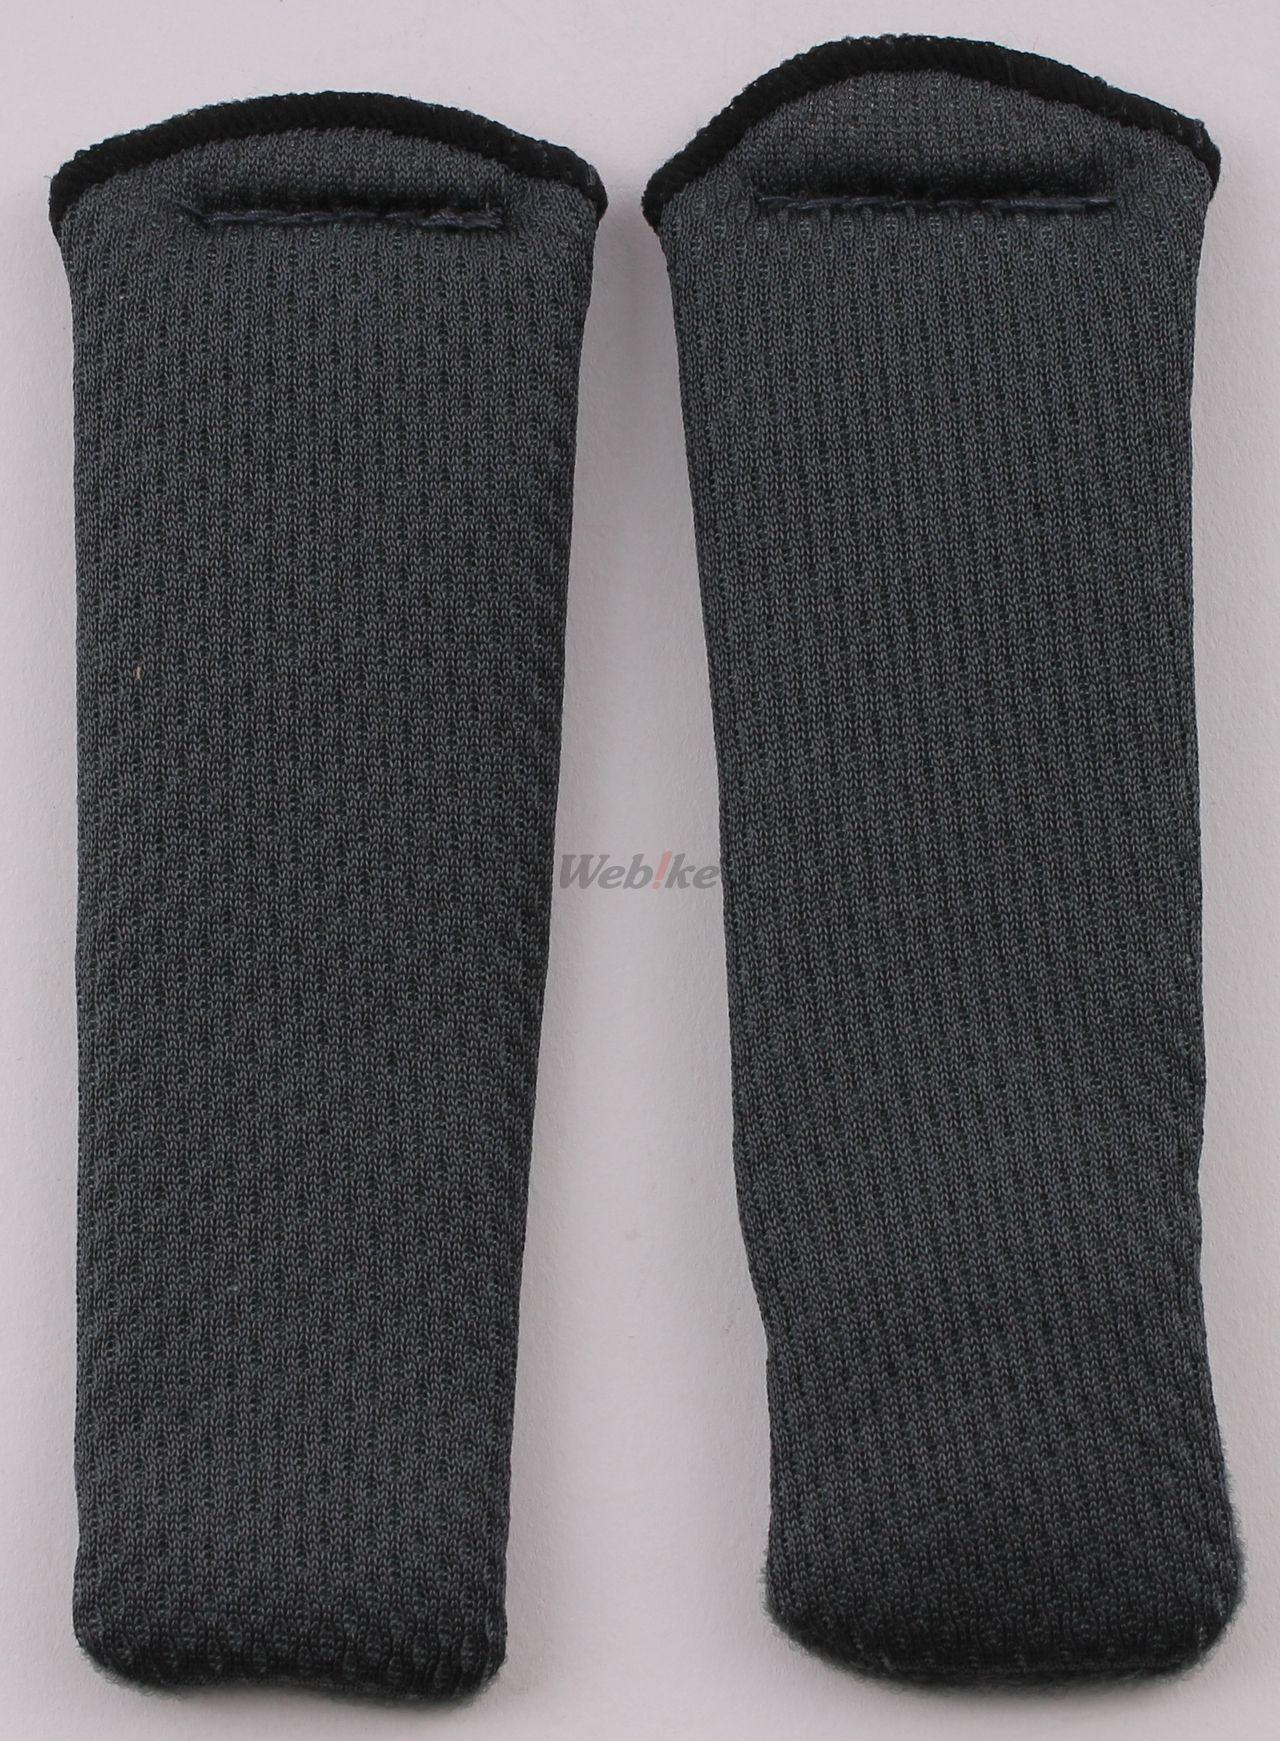 【Arai】ZF安全帽帶套 灰色 - 「Webike-摩托百貨」